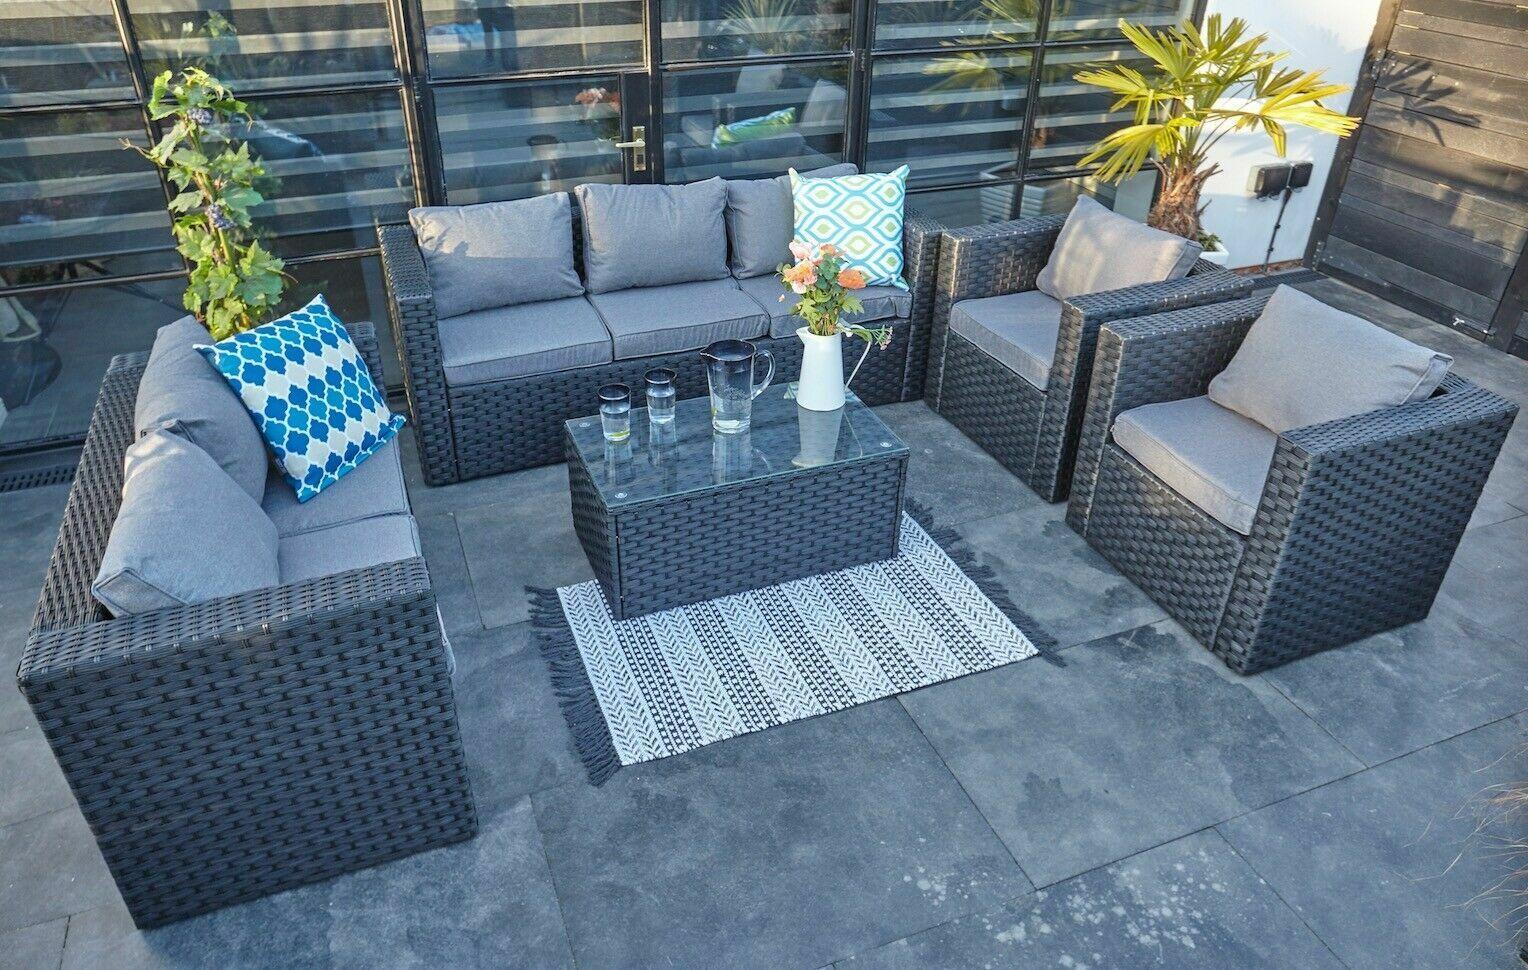 Garden Furniture - 7 SEATER RATTAN GARDEN FURNITURE SET SOFA TABLE  PATIO CONSERVATORY